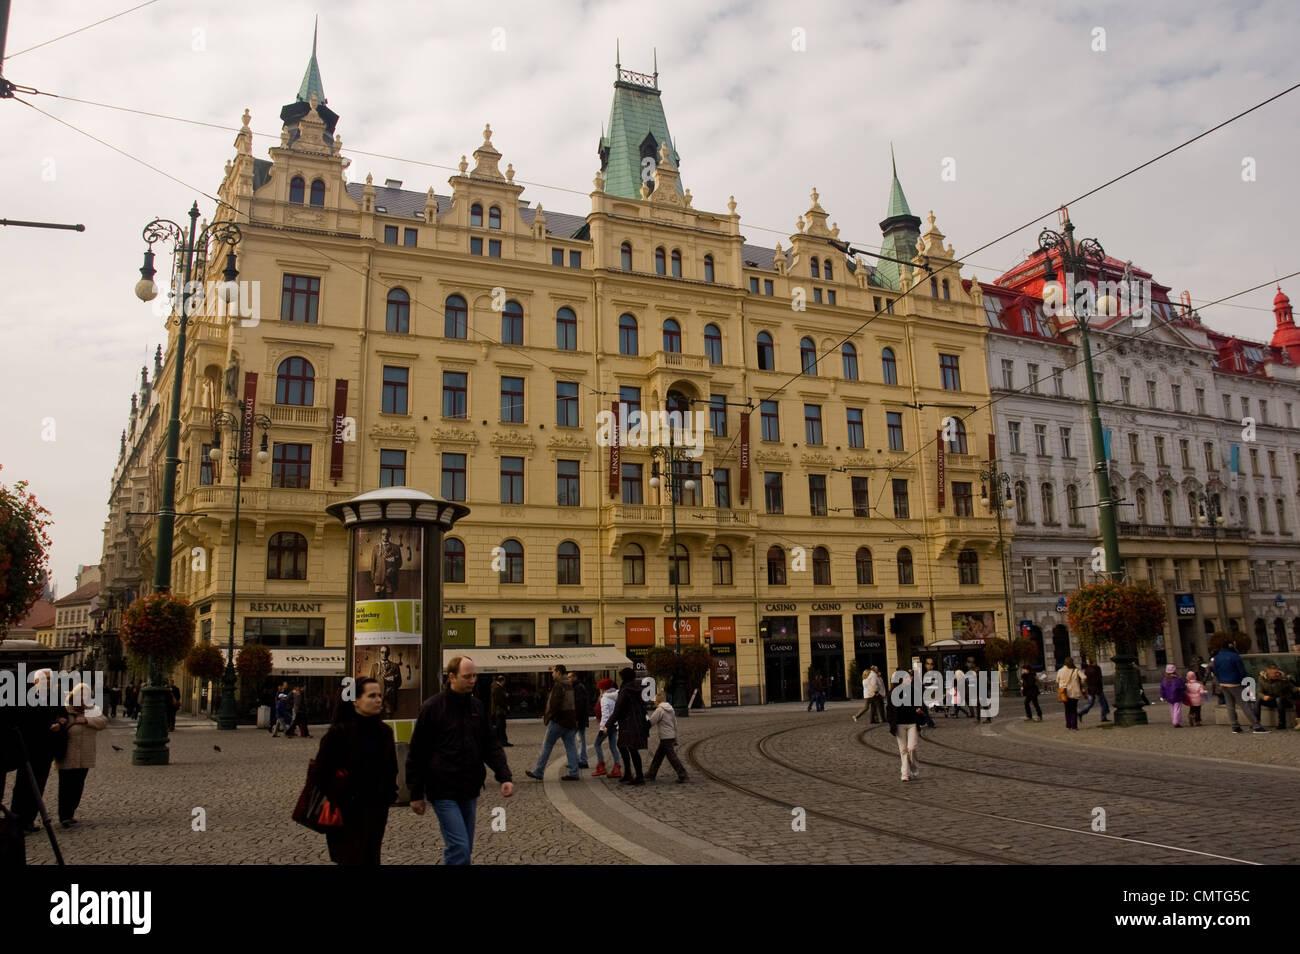 Streets of Prague - Stock Image